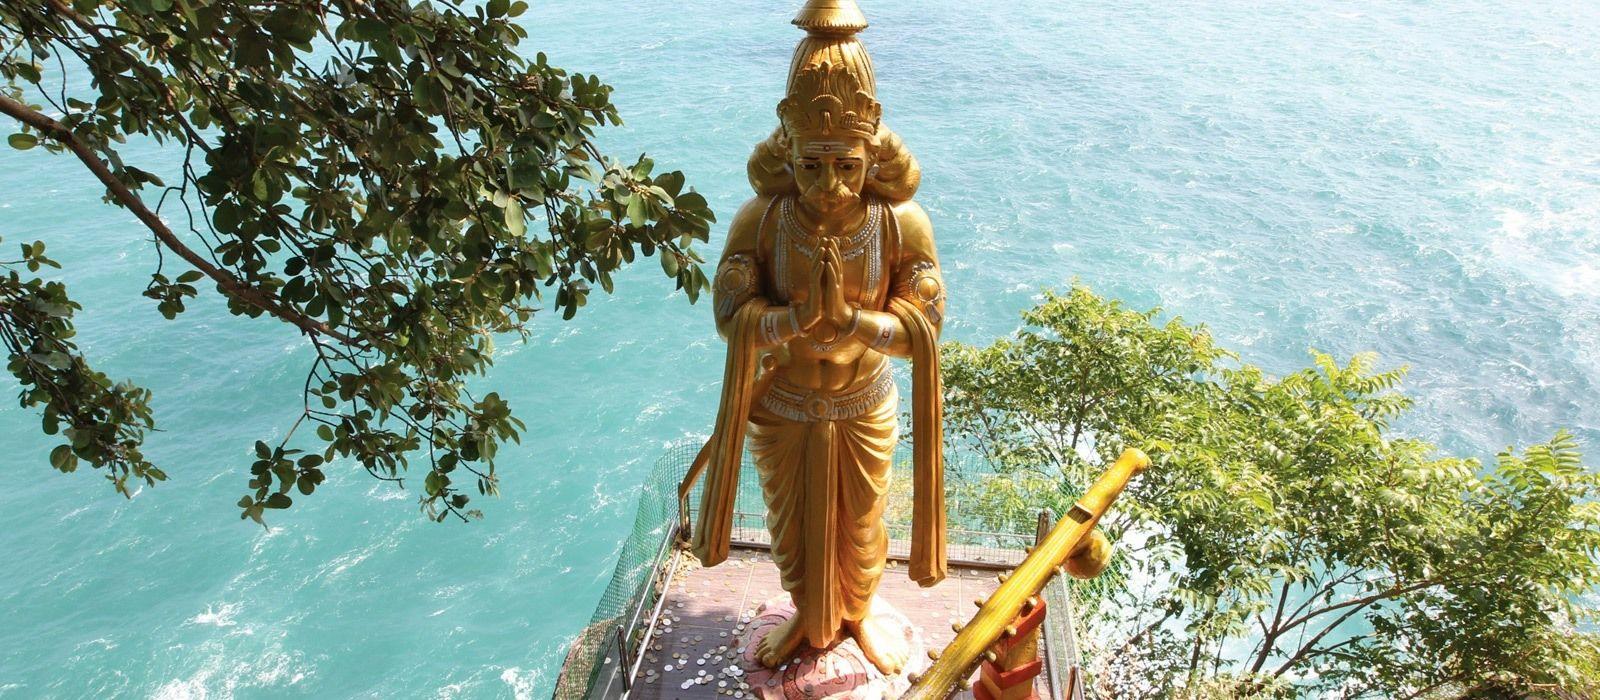 Reiseziel Trincomalee Sri Lanka